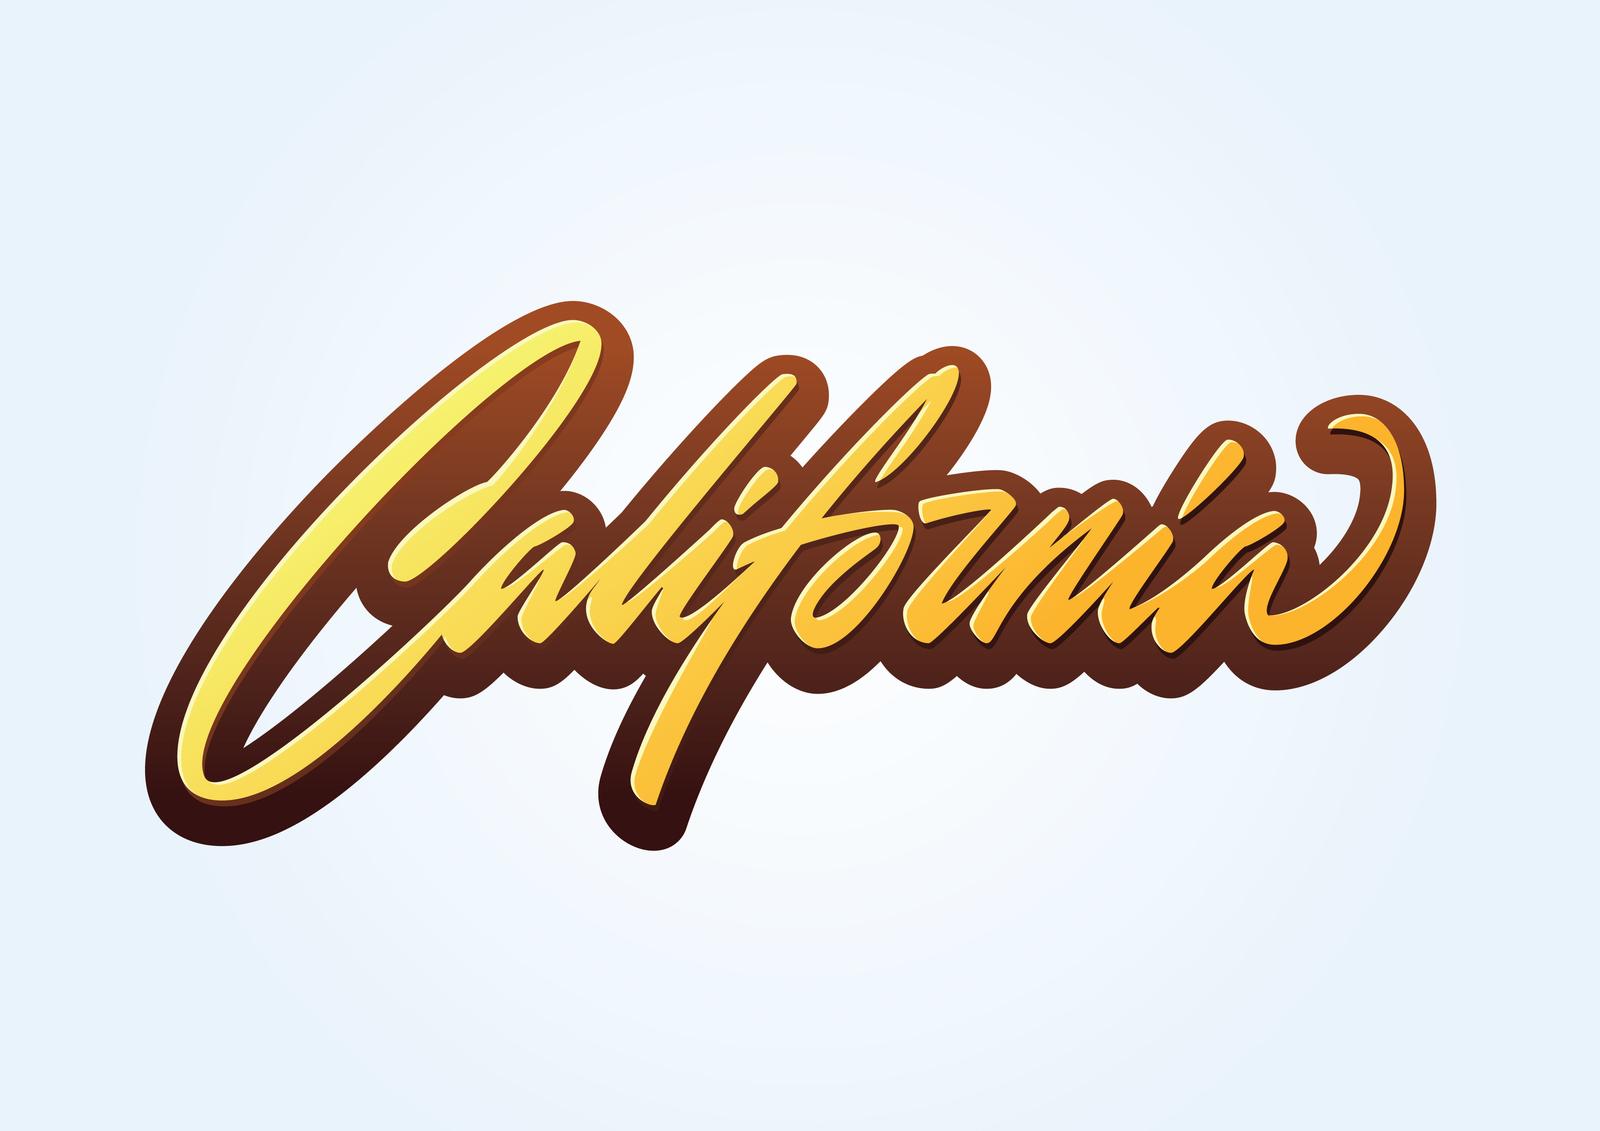 California brush script lettering